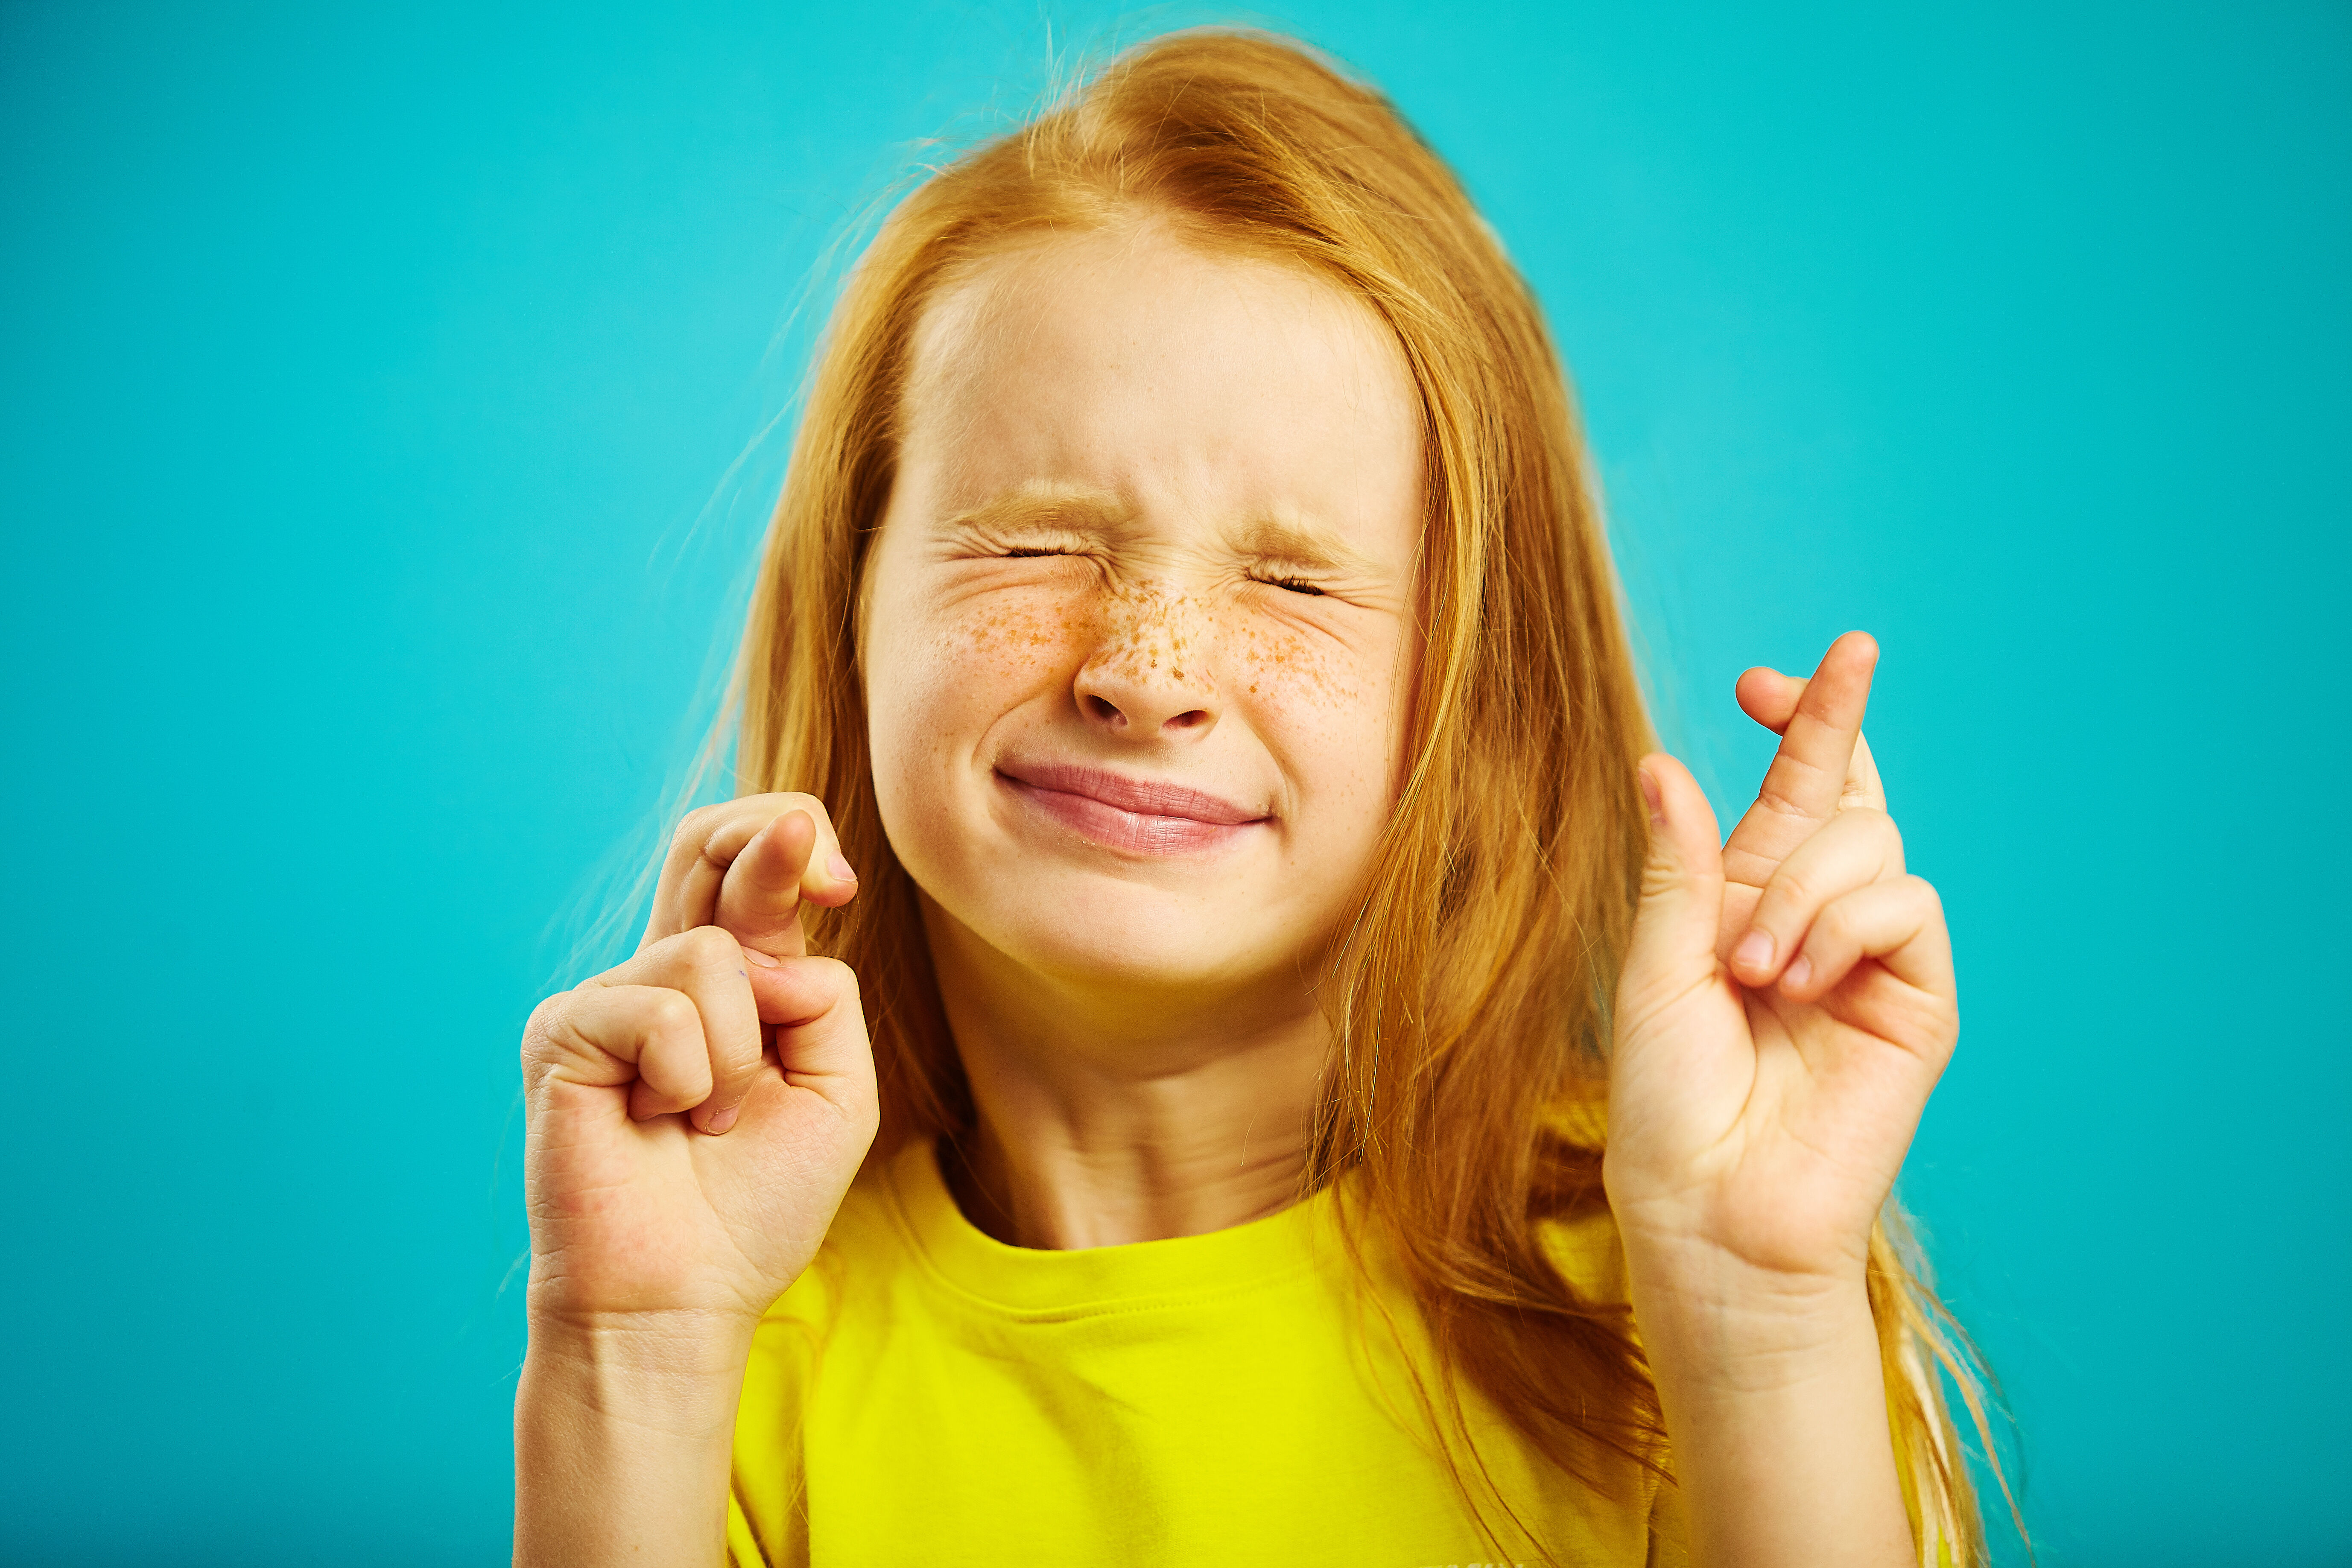 Girl crossing her fingers